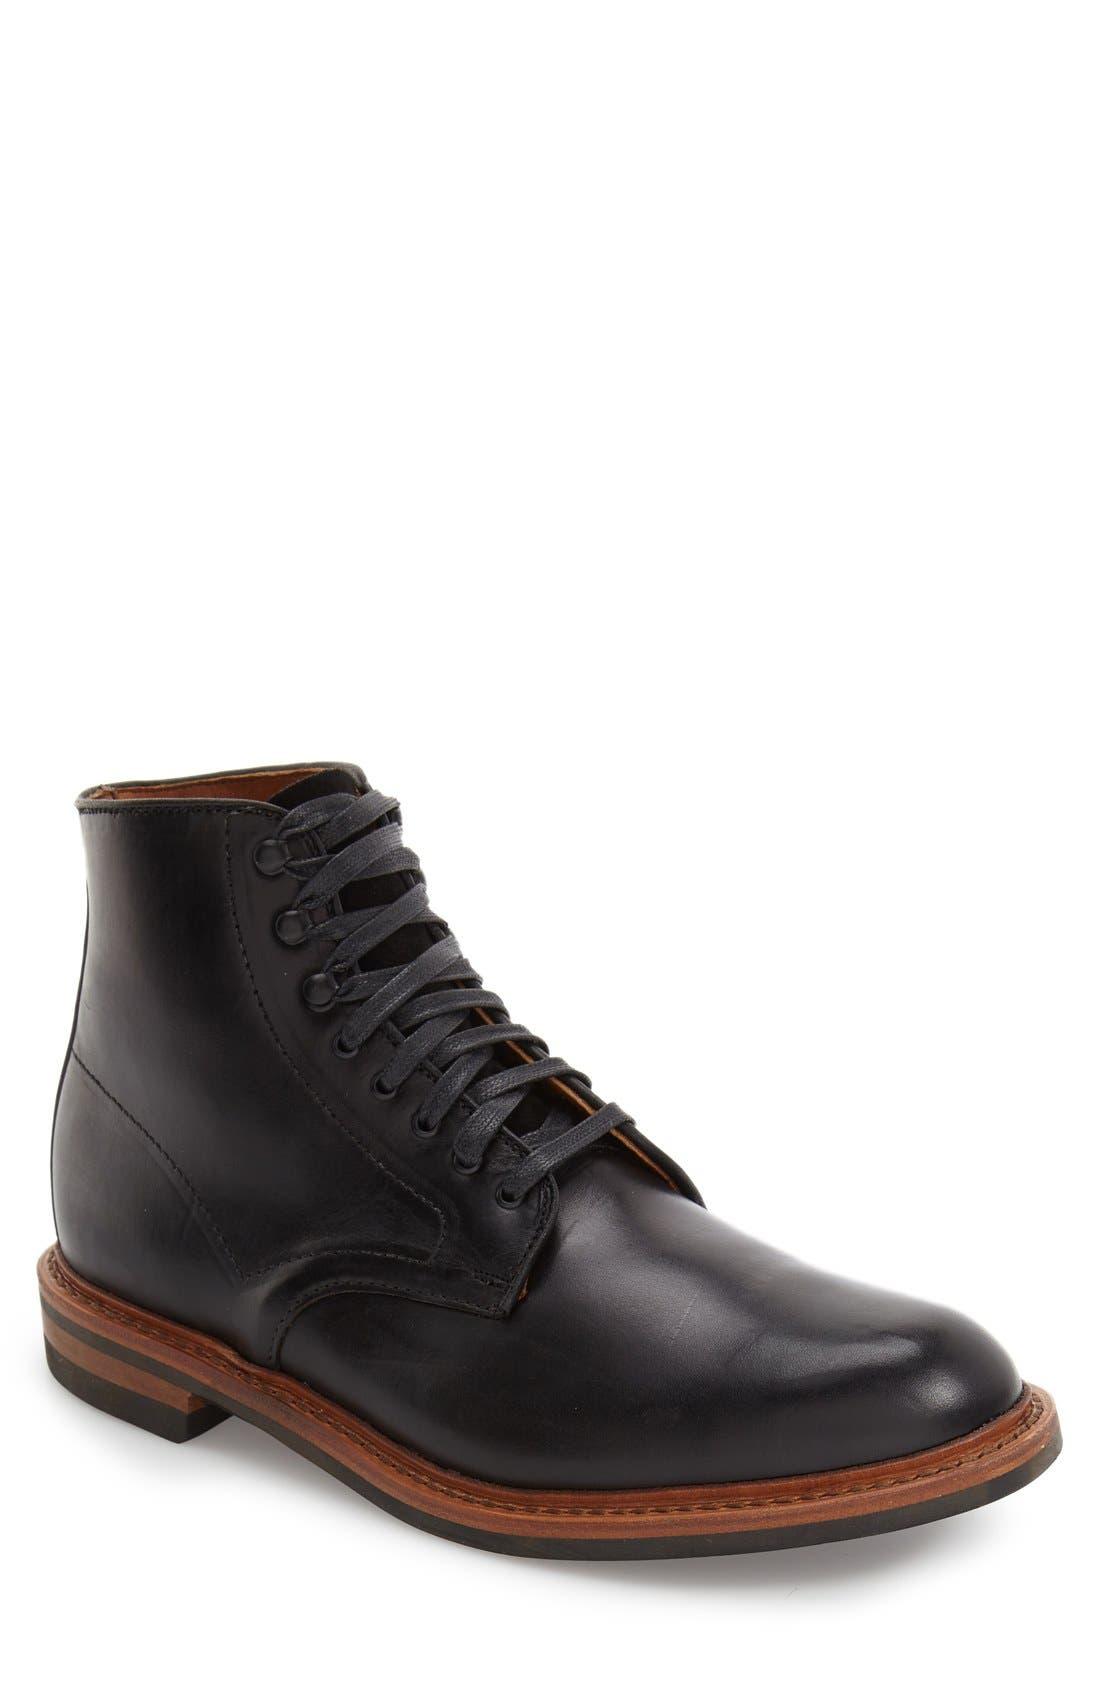 'Higgins Mill' Plain Toe Boot,                         Main,                         color, 001